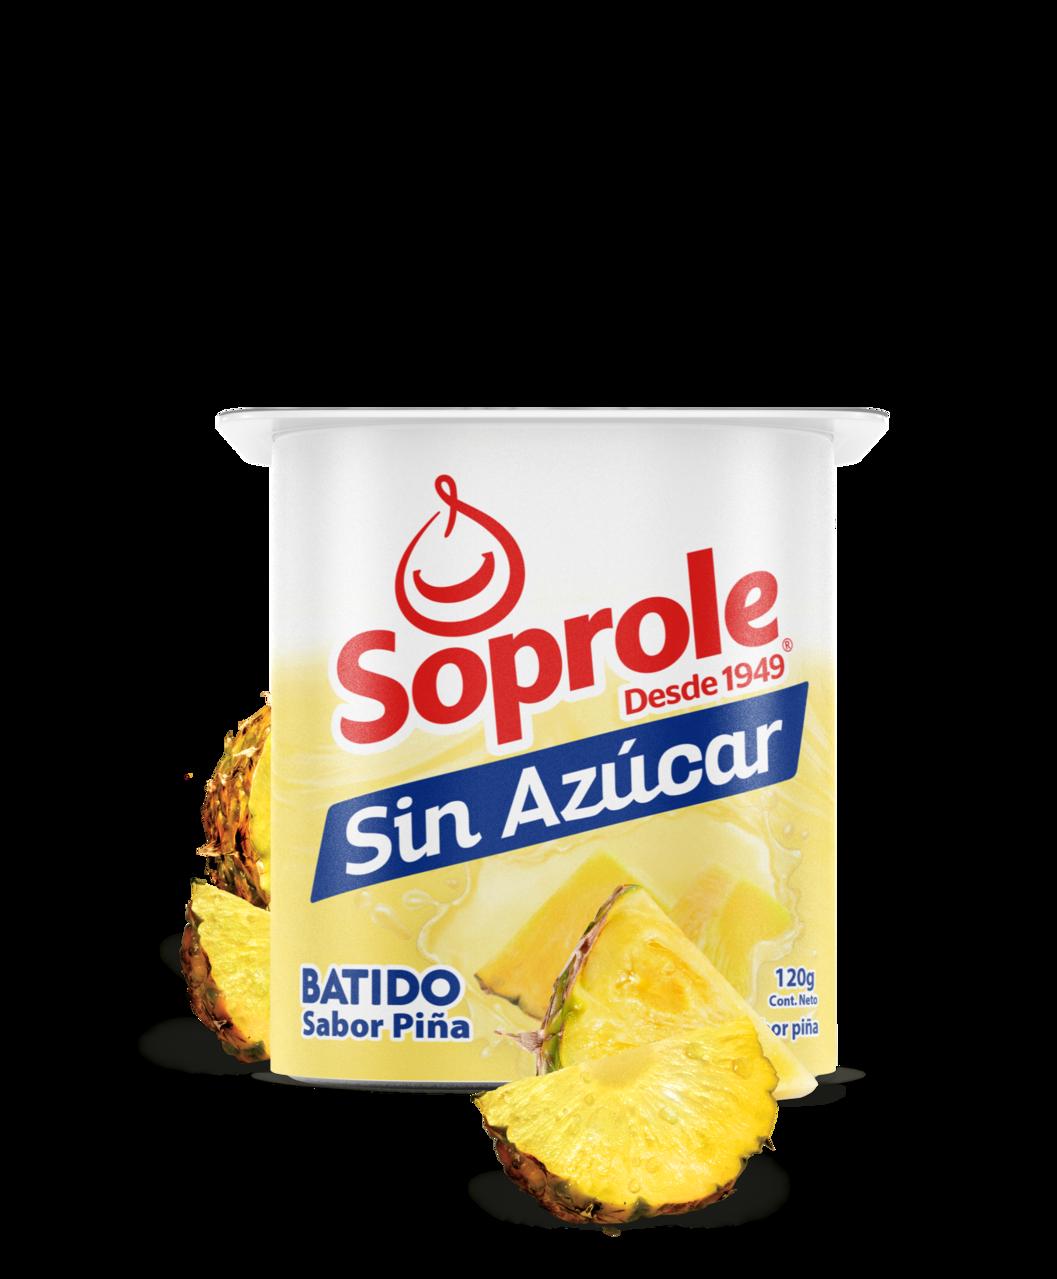 Soprole Yoghurt Batido Light sabor piña